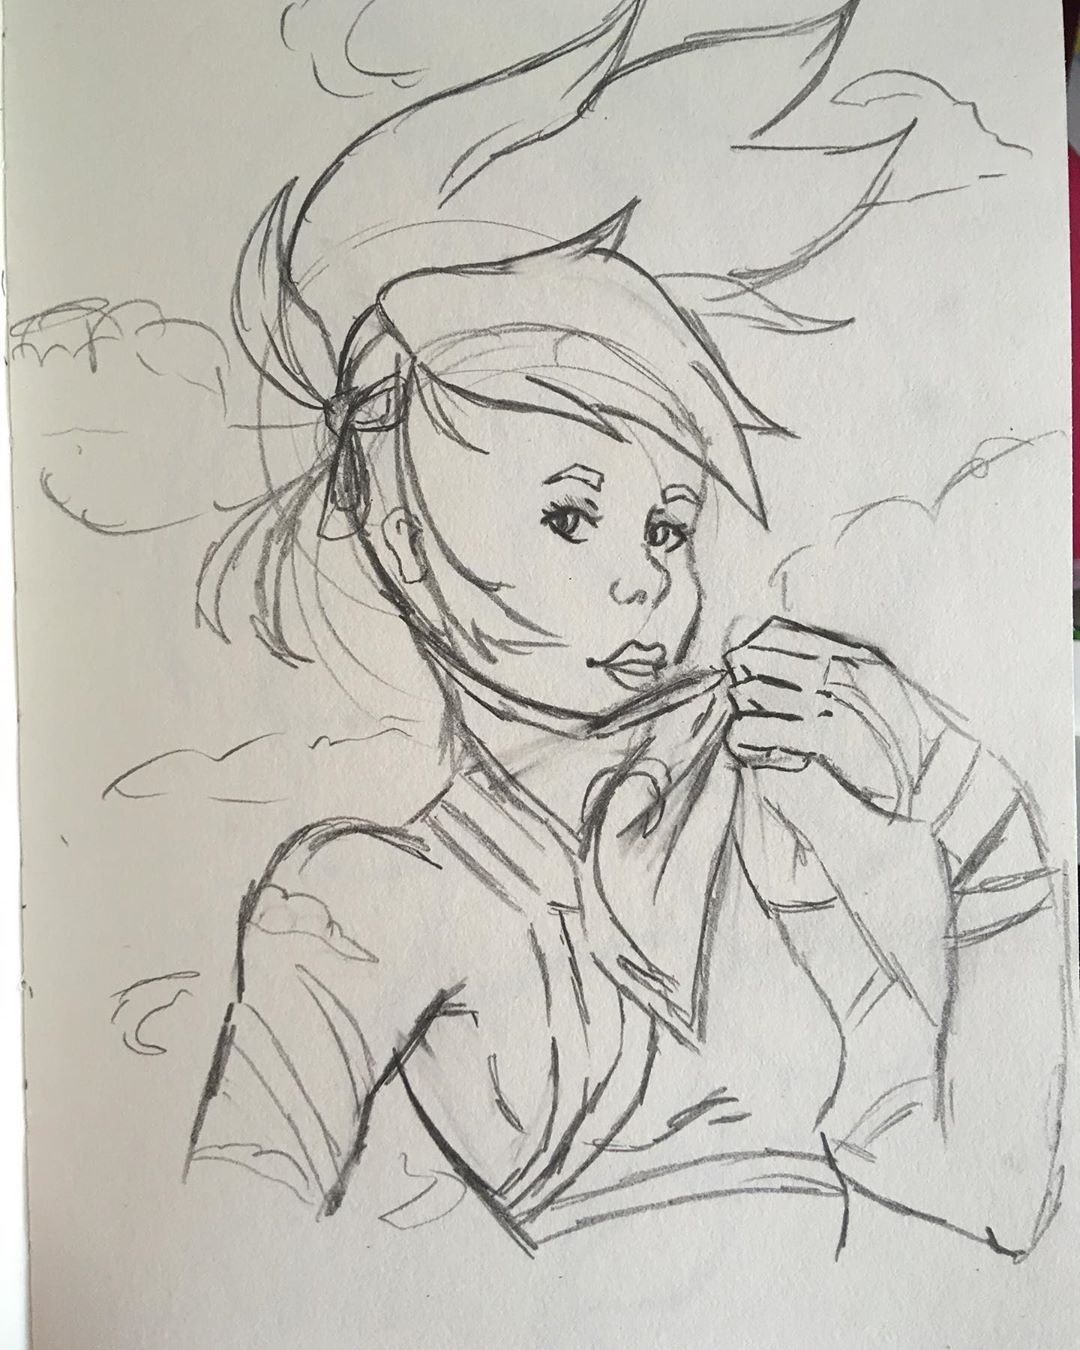 Akali sketch, anyone else play league? #art #colour #drawing #painting #cute #water #blue #chibi #Gaming  #doodles #fantasyart #portrait #portraitartist #leagueoflegends&